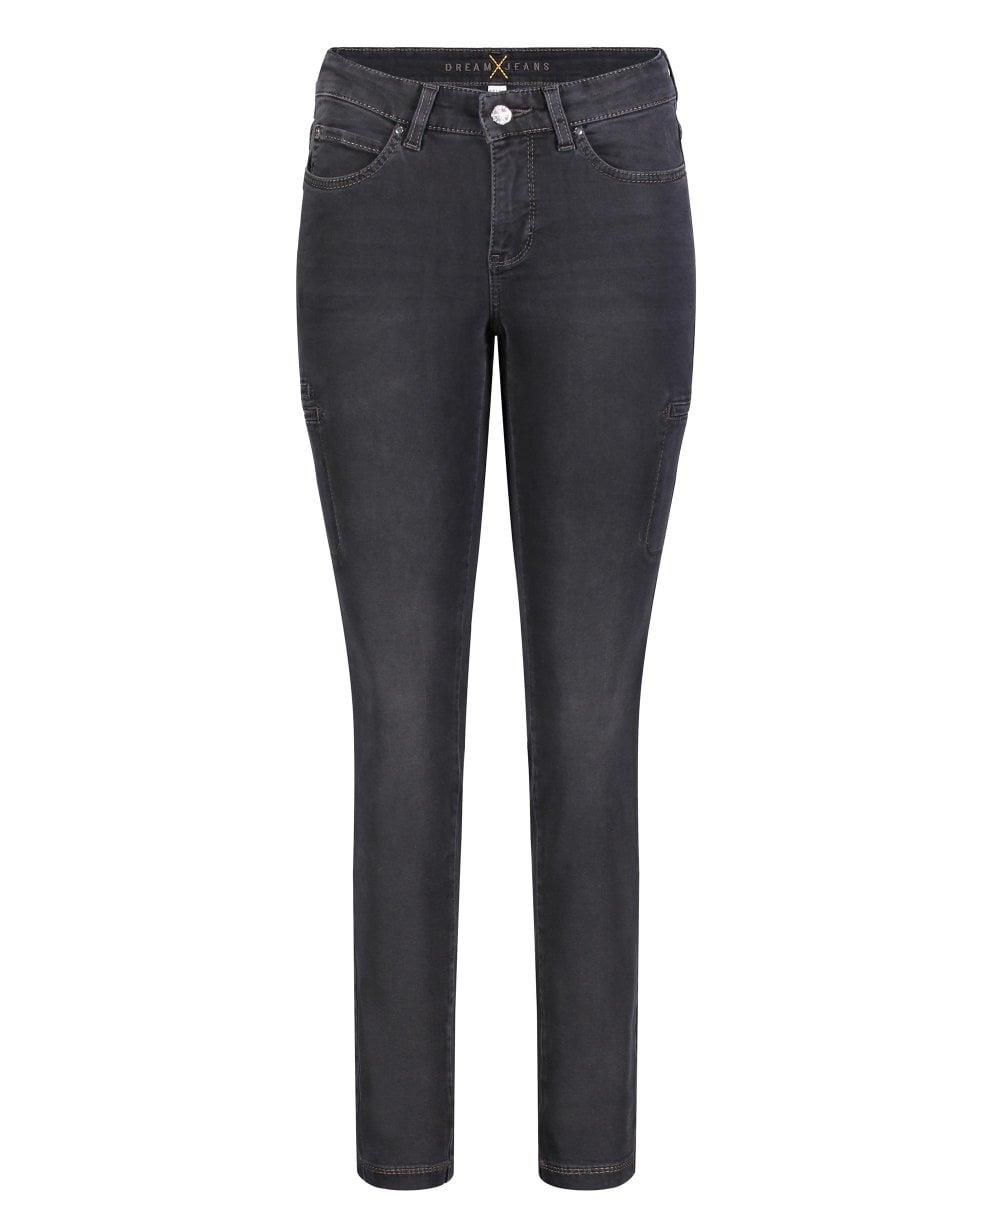 mac dream skinny cargo jean jeans from luxury uk. Black Bedroom Furniture Sets. Home Design Ideas